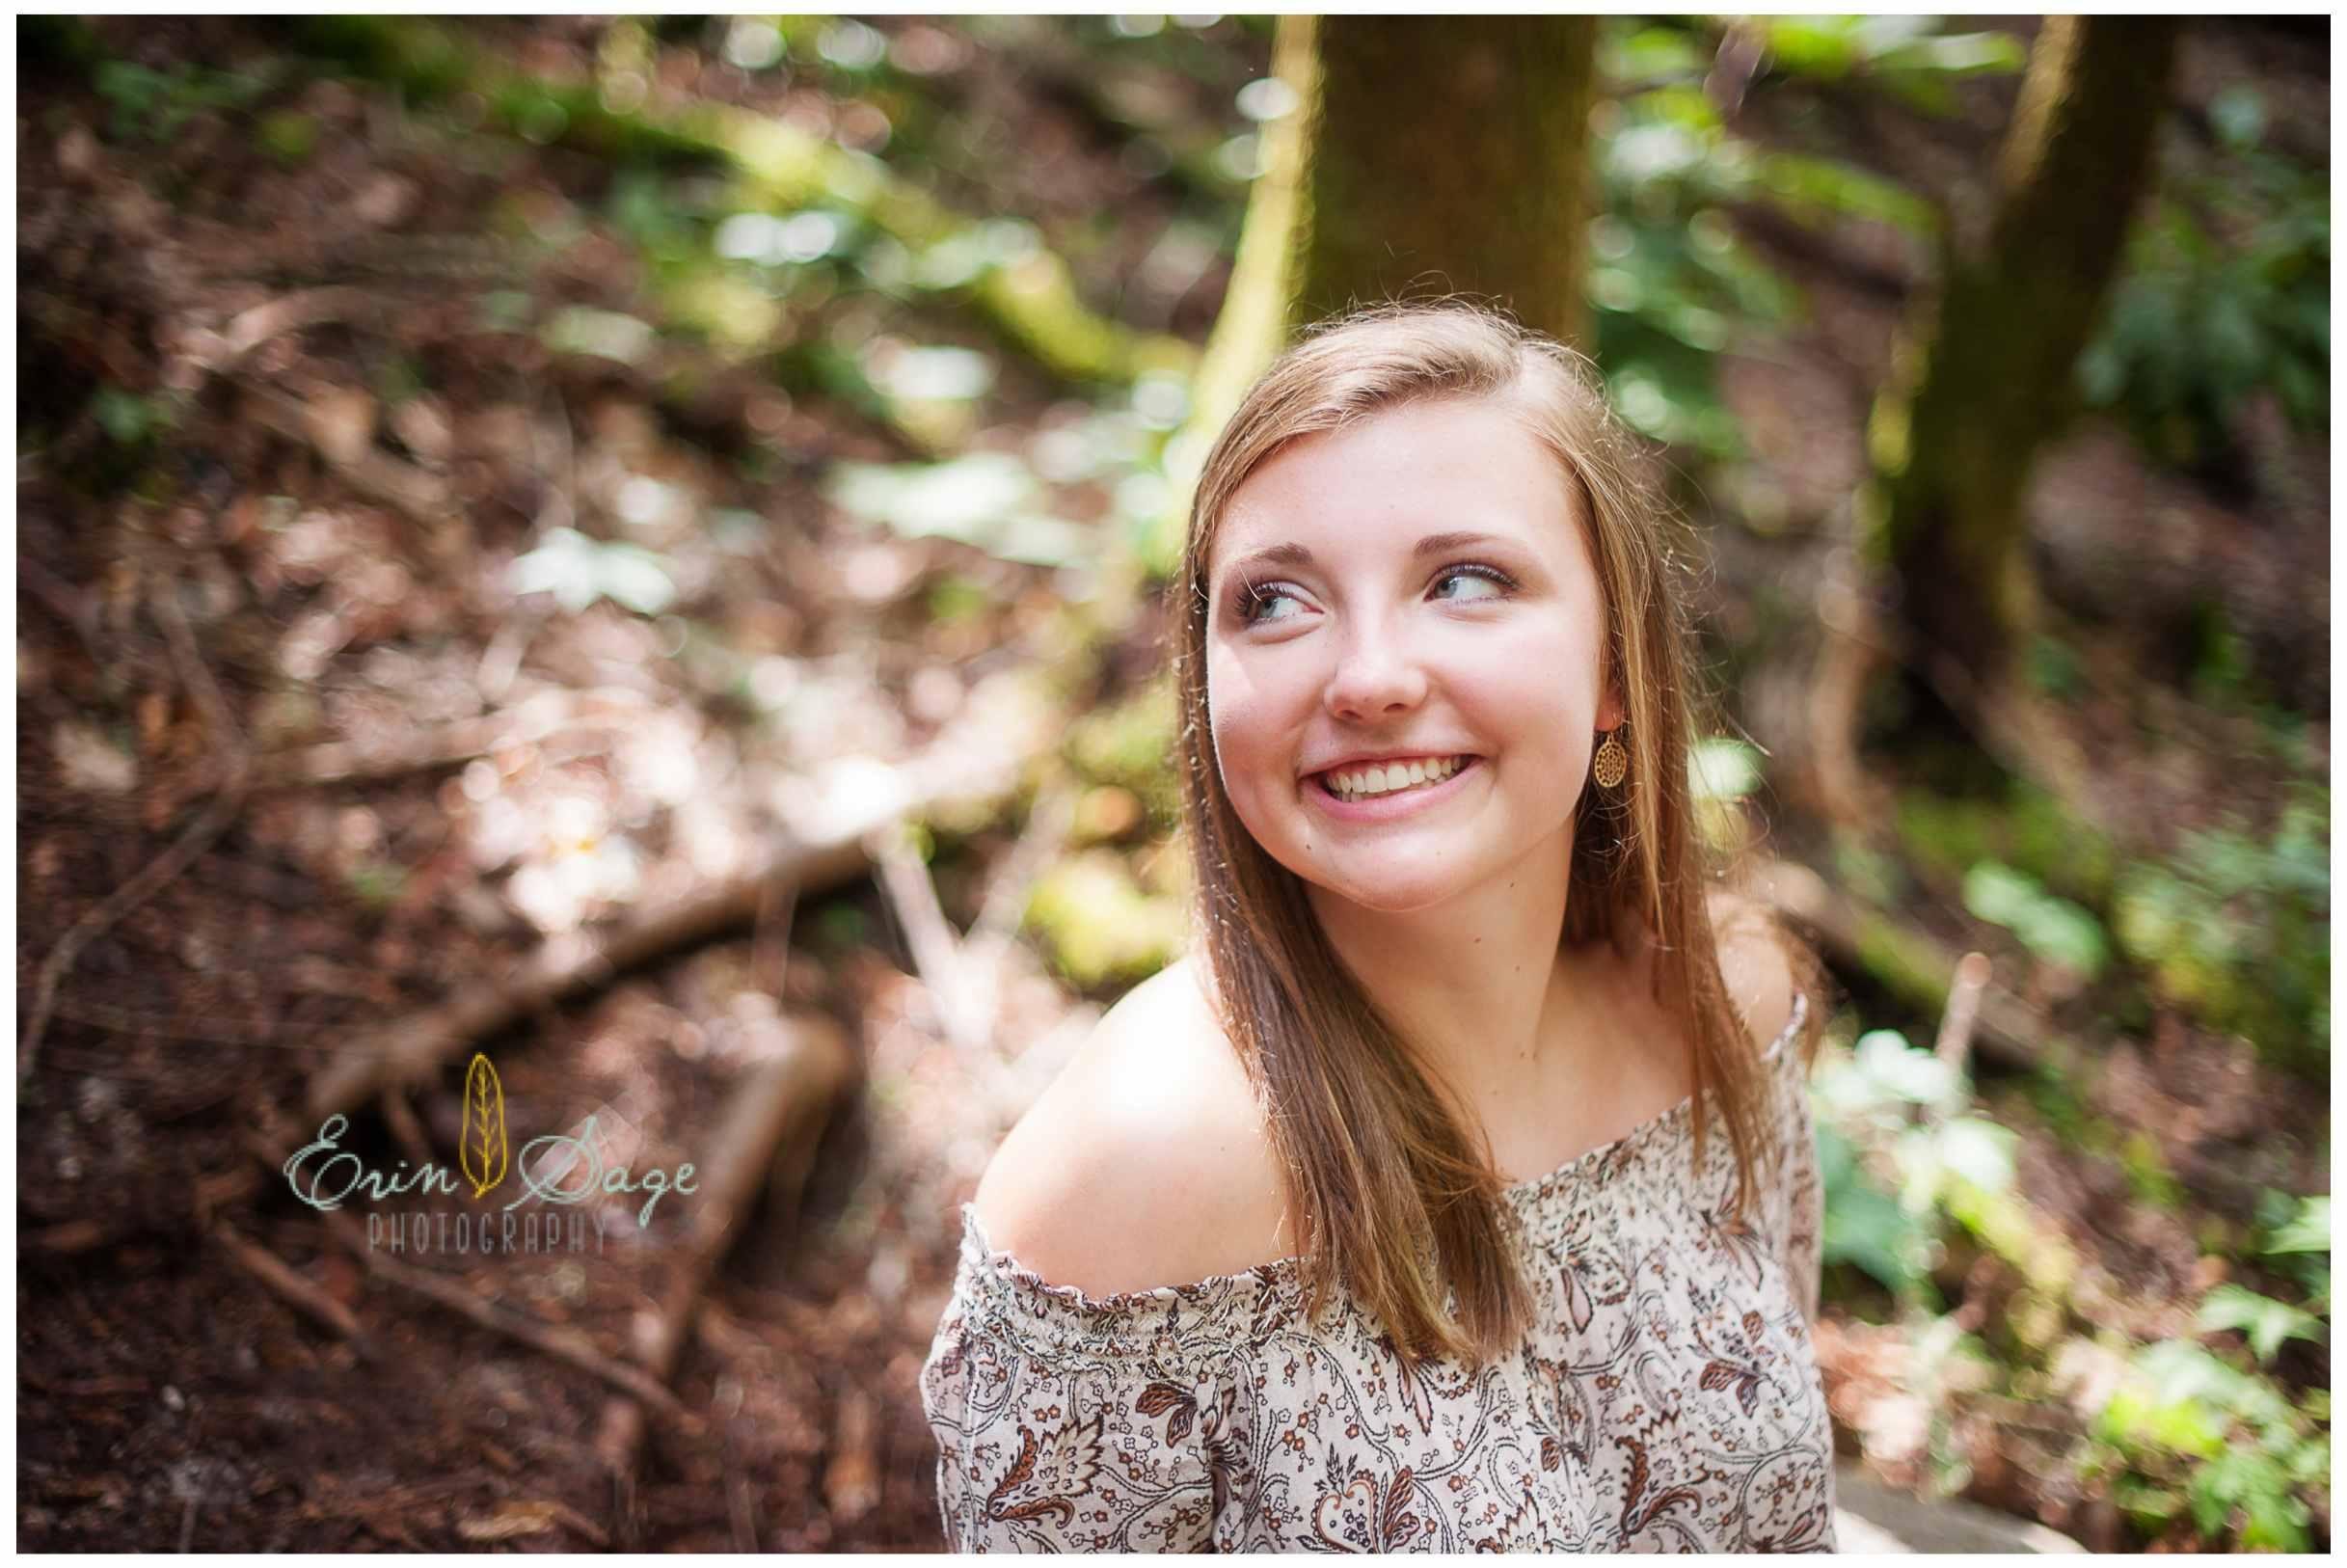 Erin Sage Photography Blog Journal